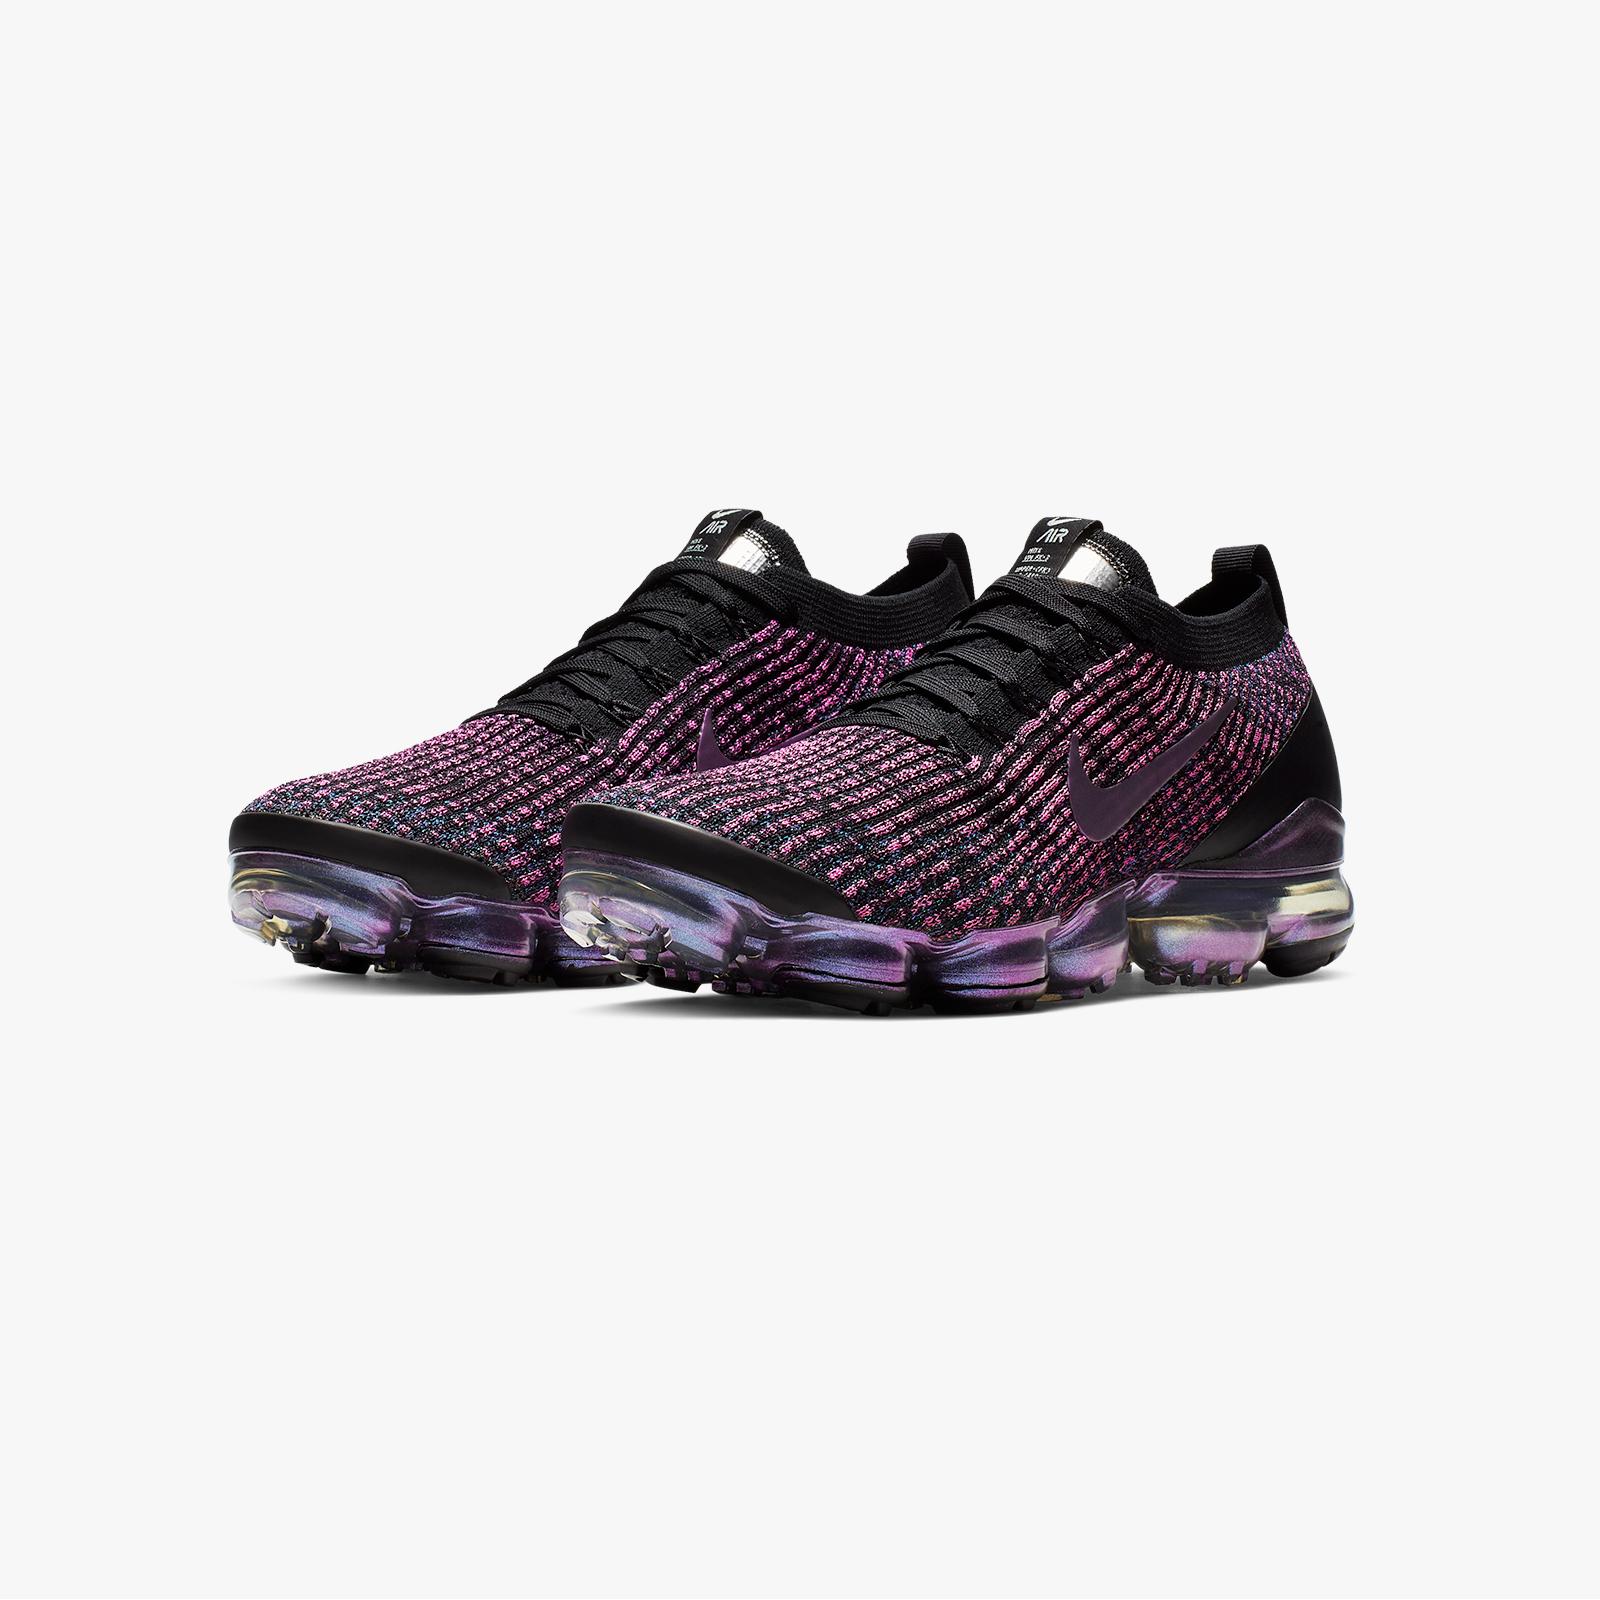 b76238af065 Nike Air Vapormax Flyknit 3 - Aj6900-007 - Sneakersnstuff | sneakers &  streetwear online since 1999